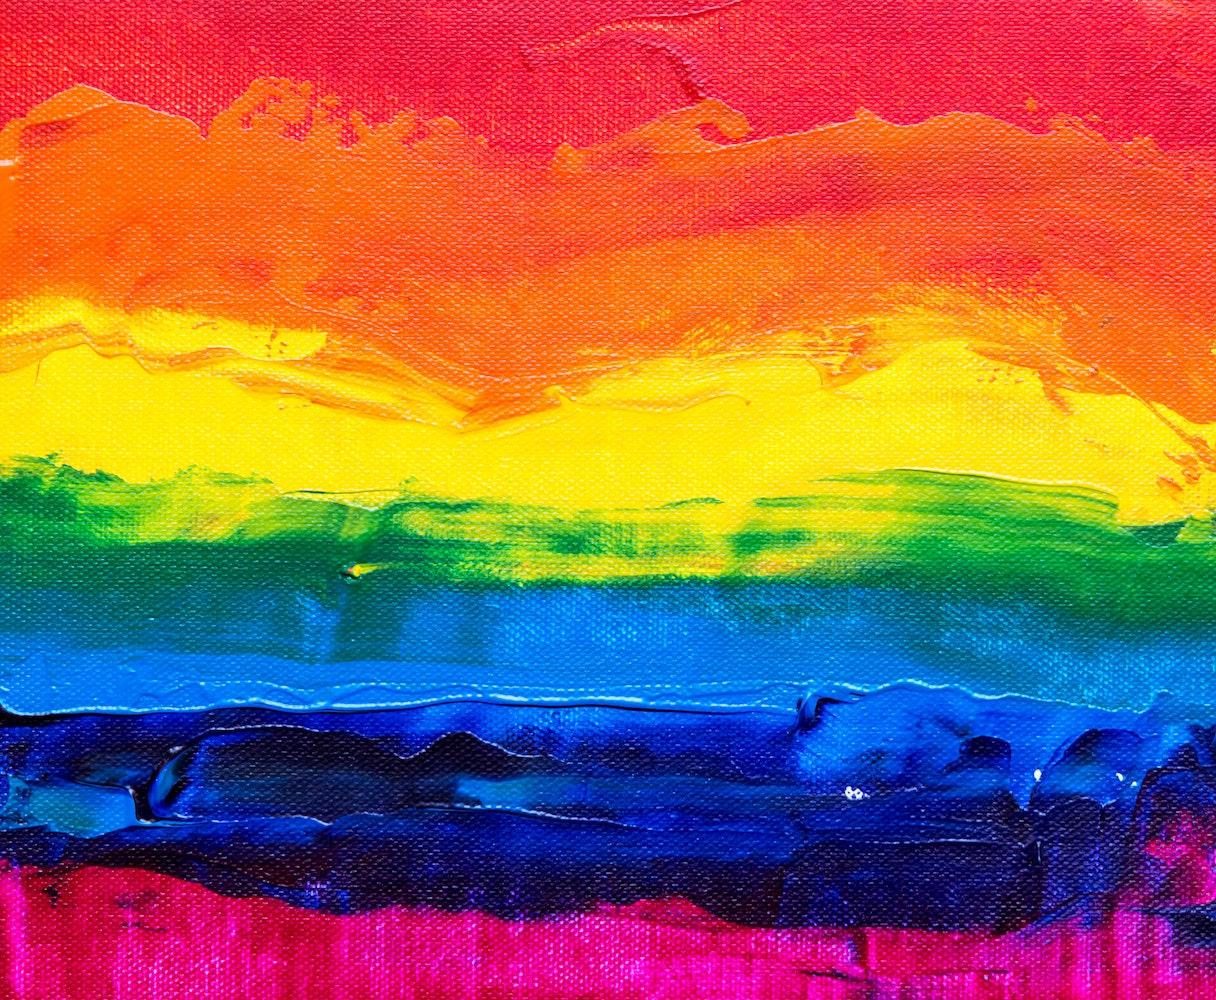 500 Interesting Rainbow Flag Photos Pexels Free Stock Photos